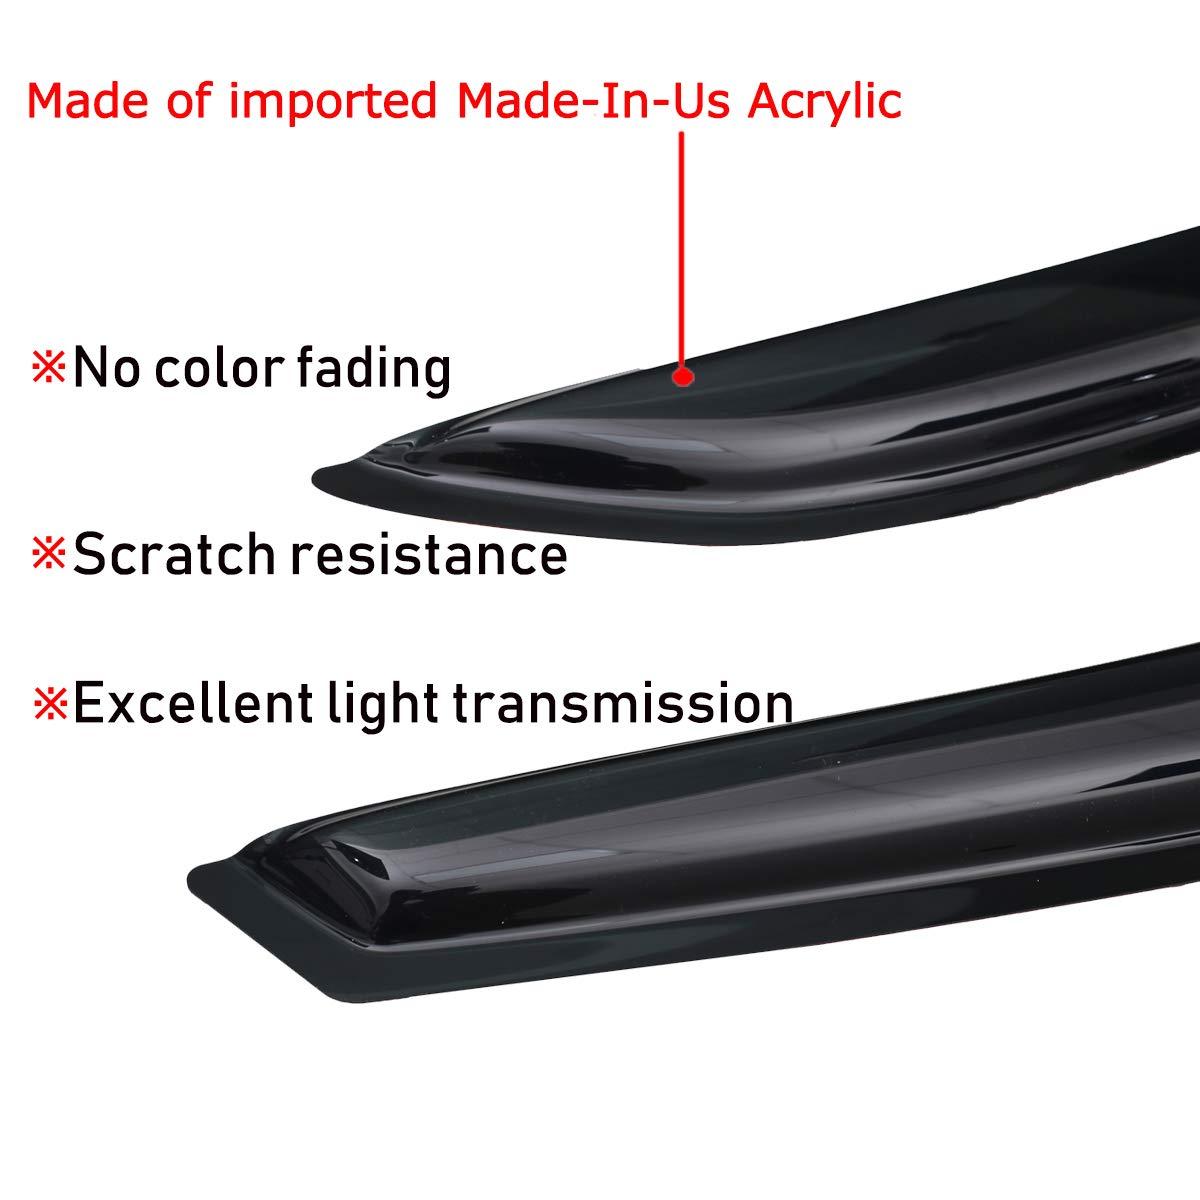 Lightronic Side Window Deflector WV94257 Vent Visor for Mazda 3 Sedan 2010-2013 4 Piece Set